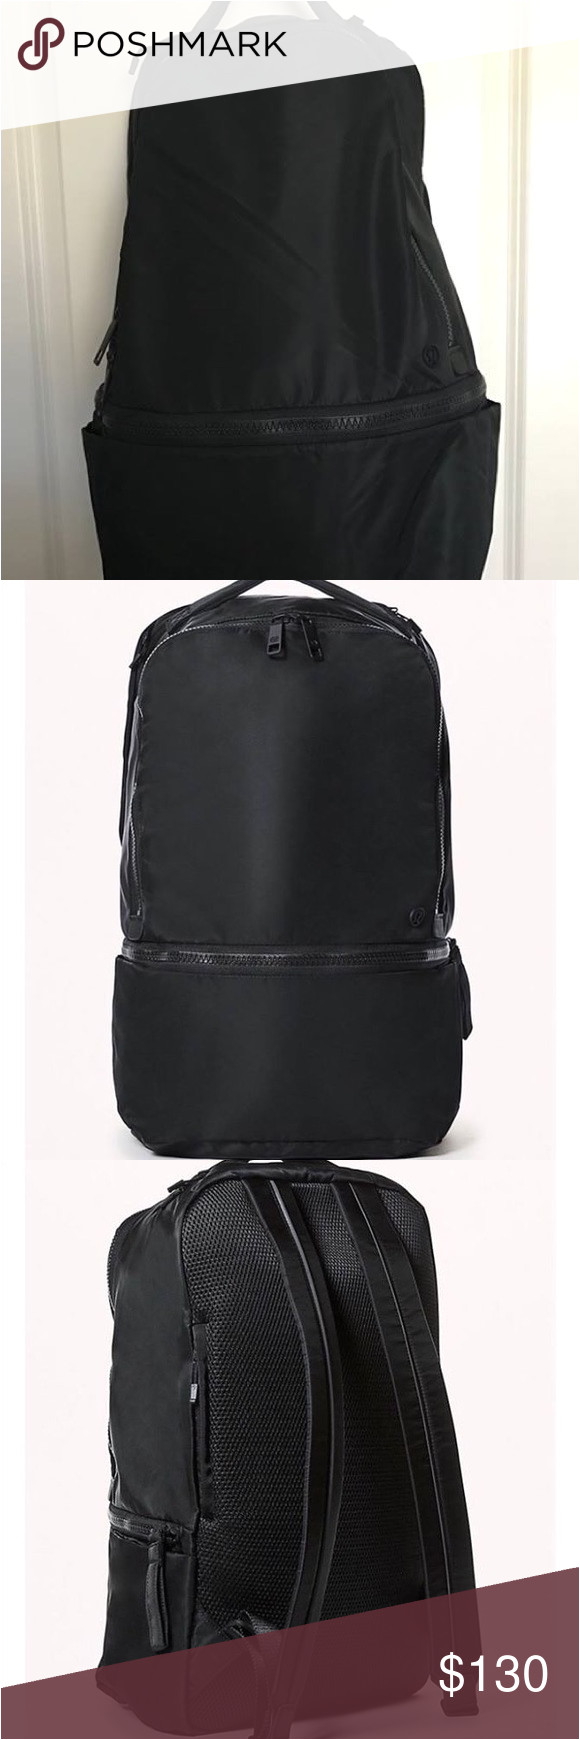 lululemon go lightly 24l backpack never used expandable bottom pocket quick access phone